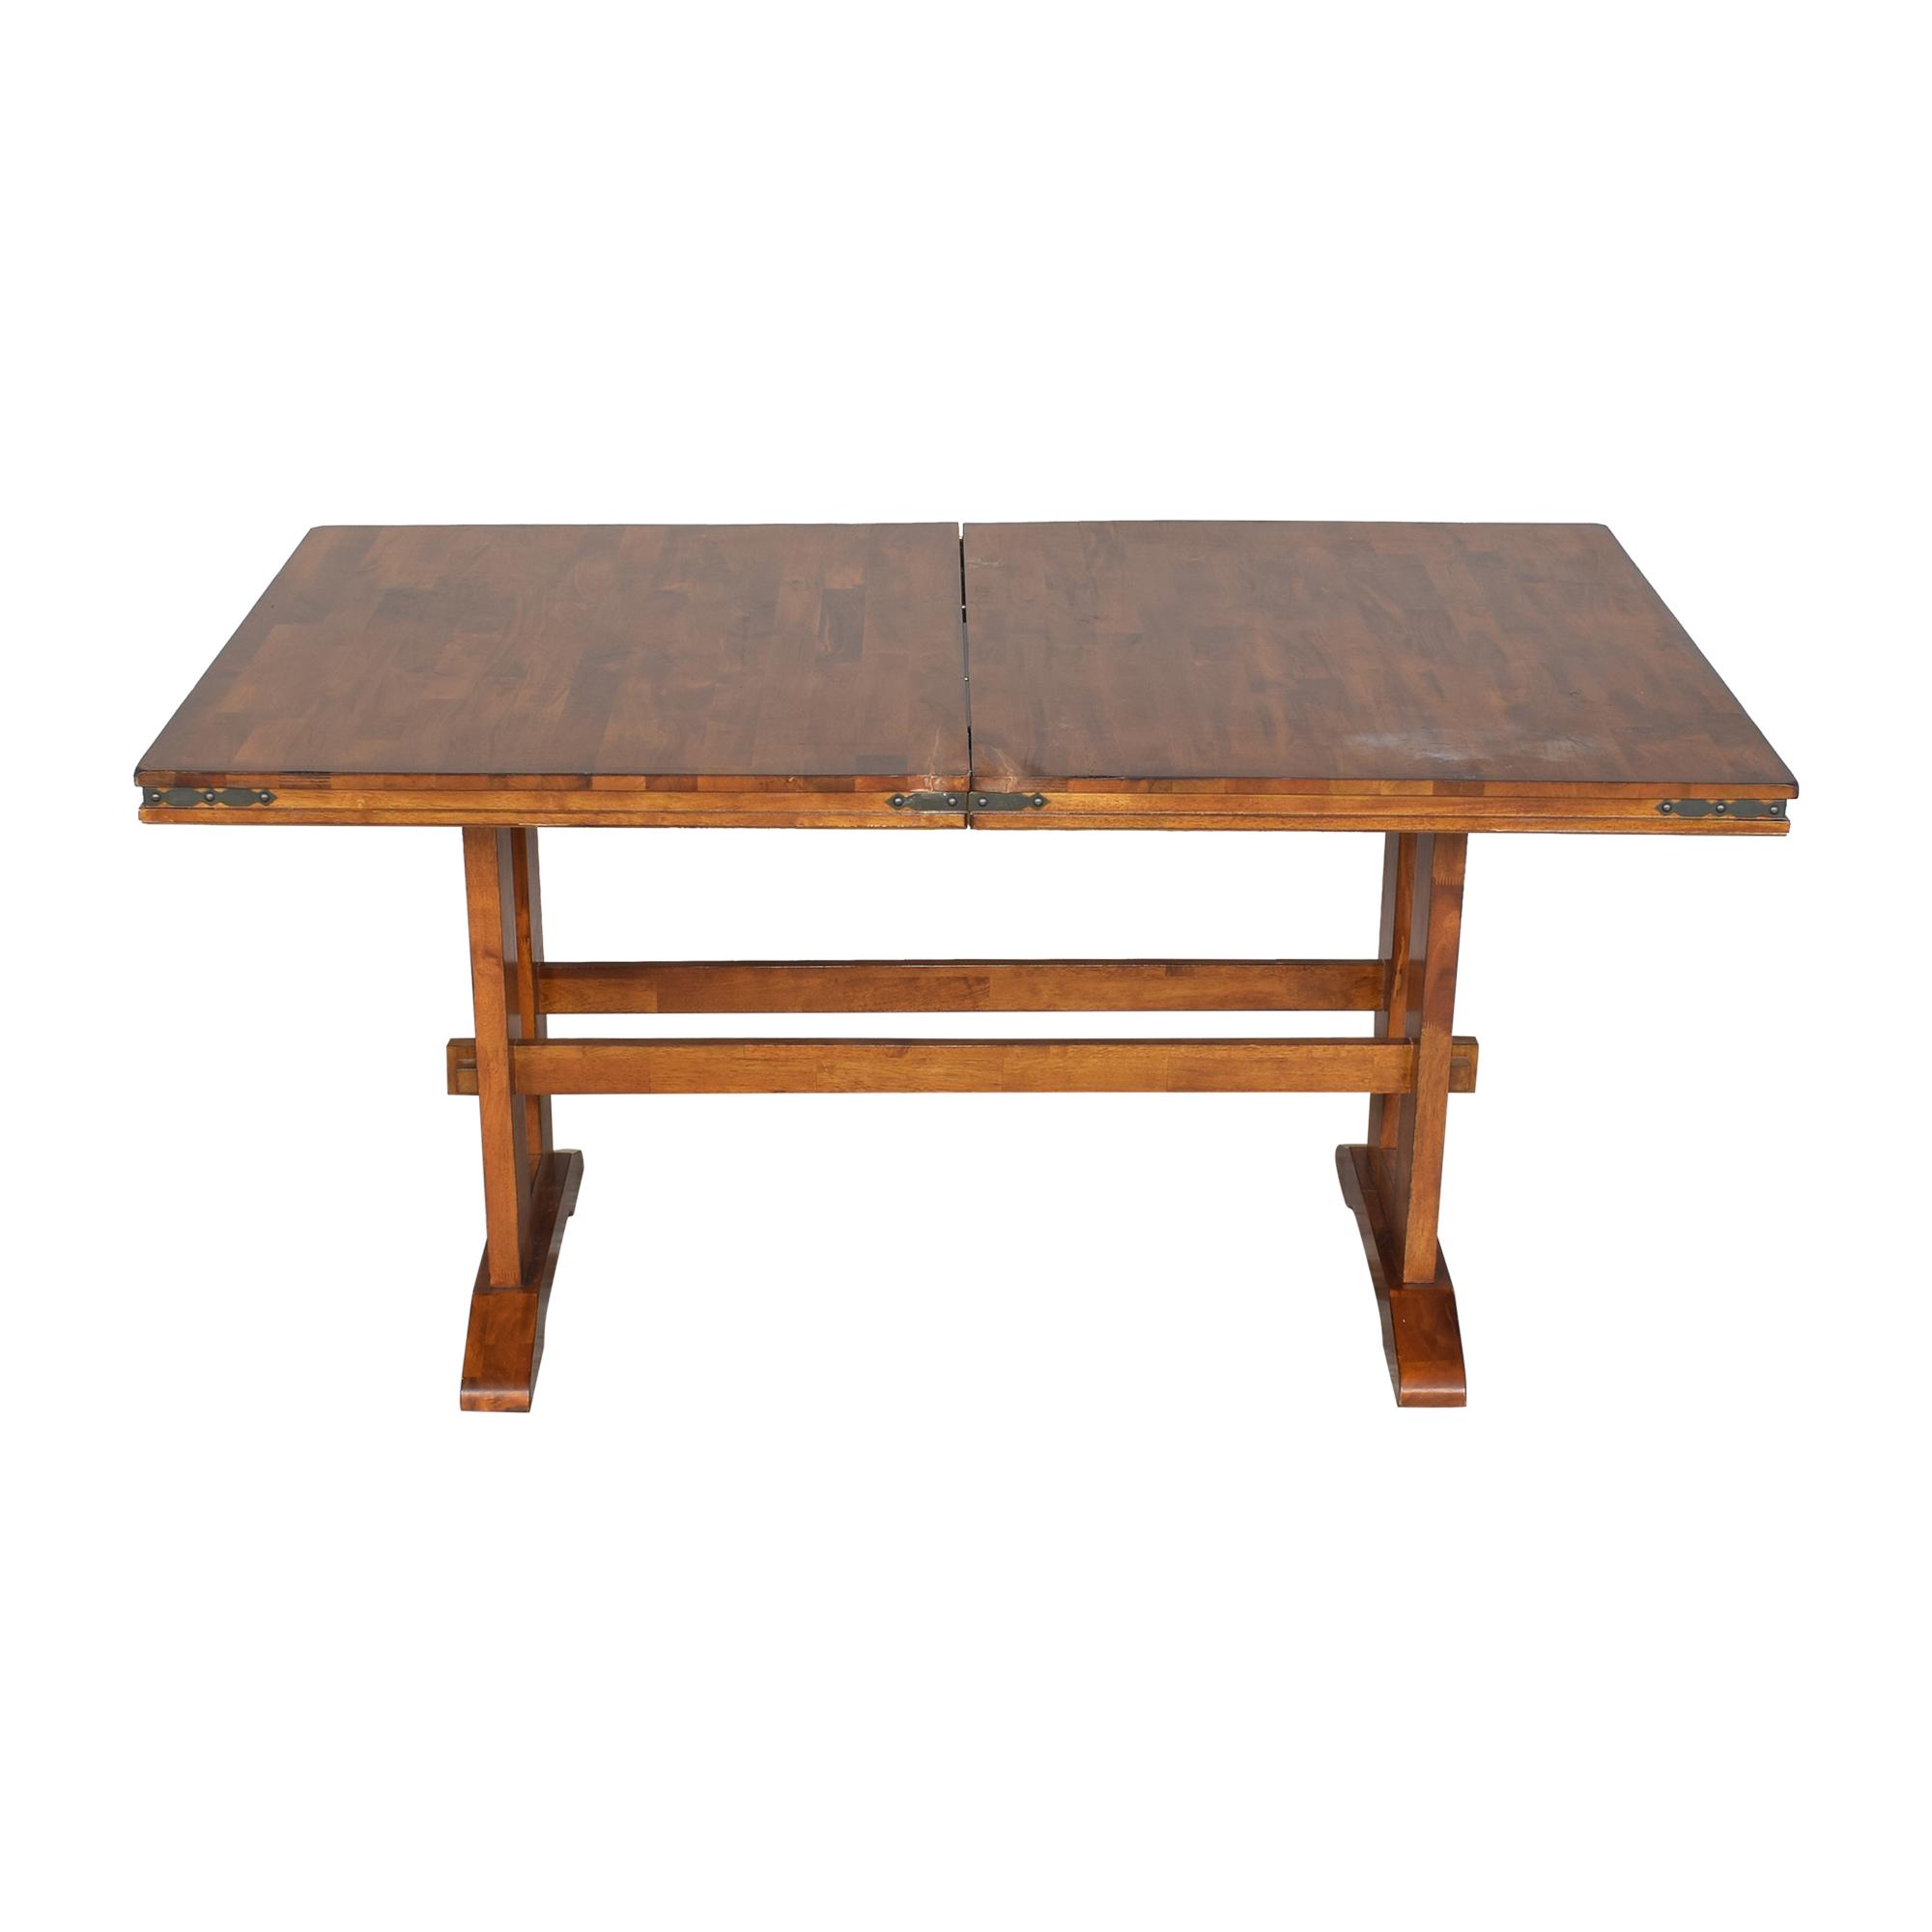 Lenox Lenox Extendable Dining Table pa